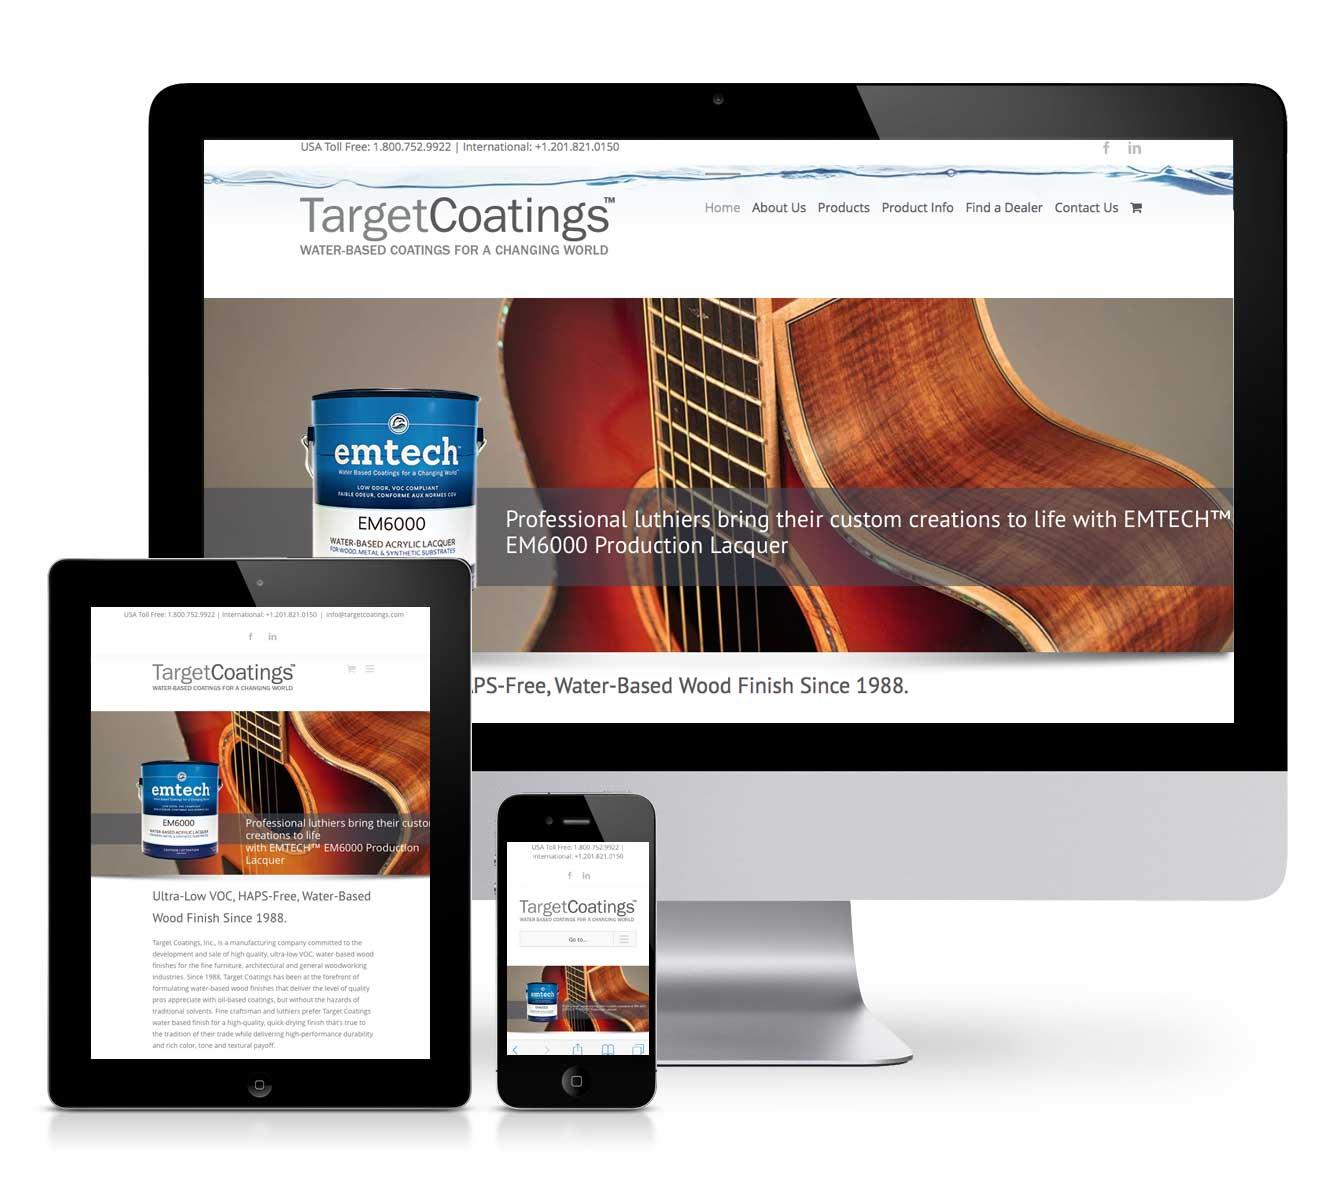 TargetCoatings.com